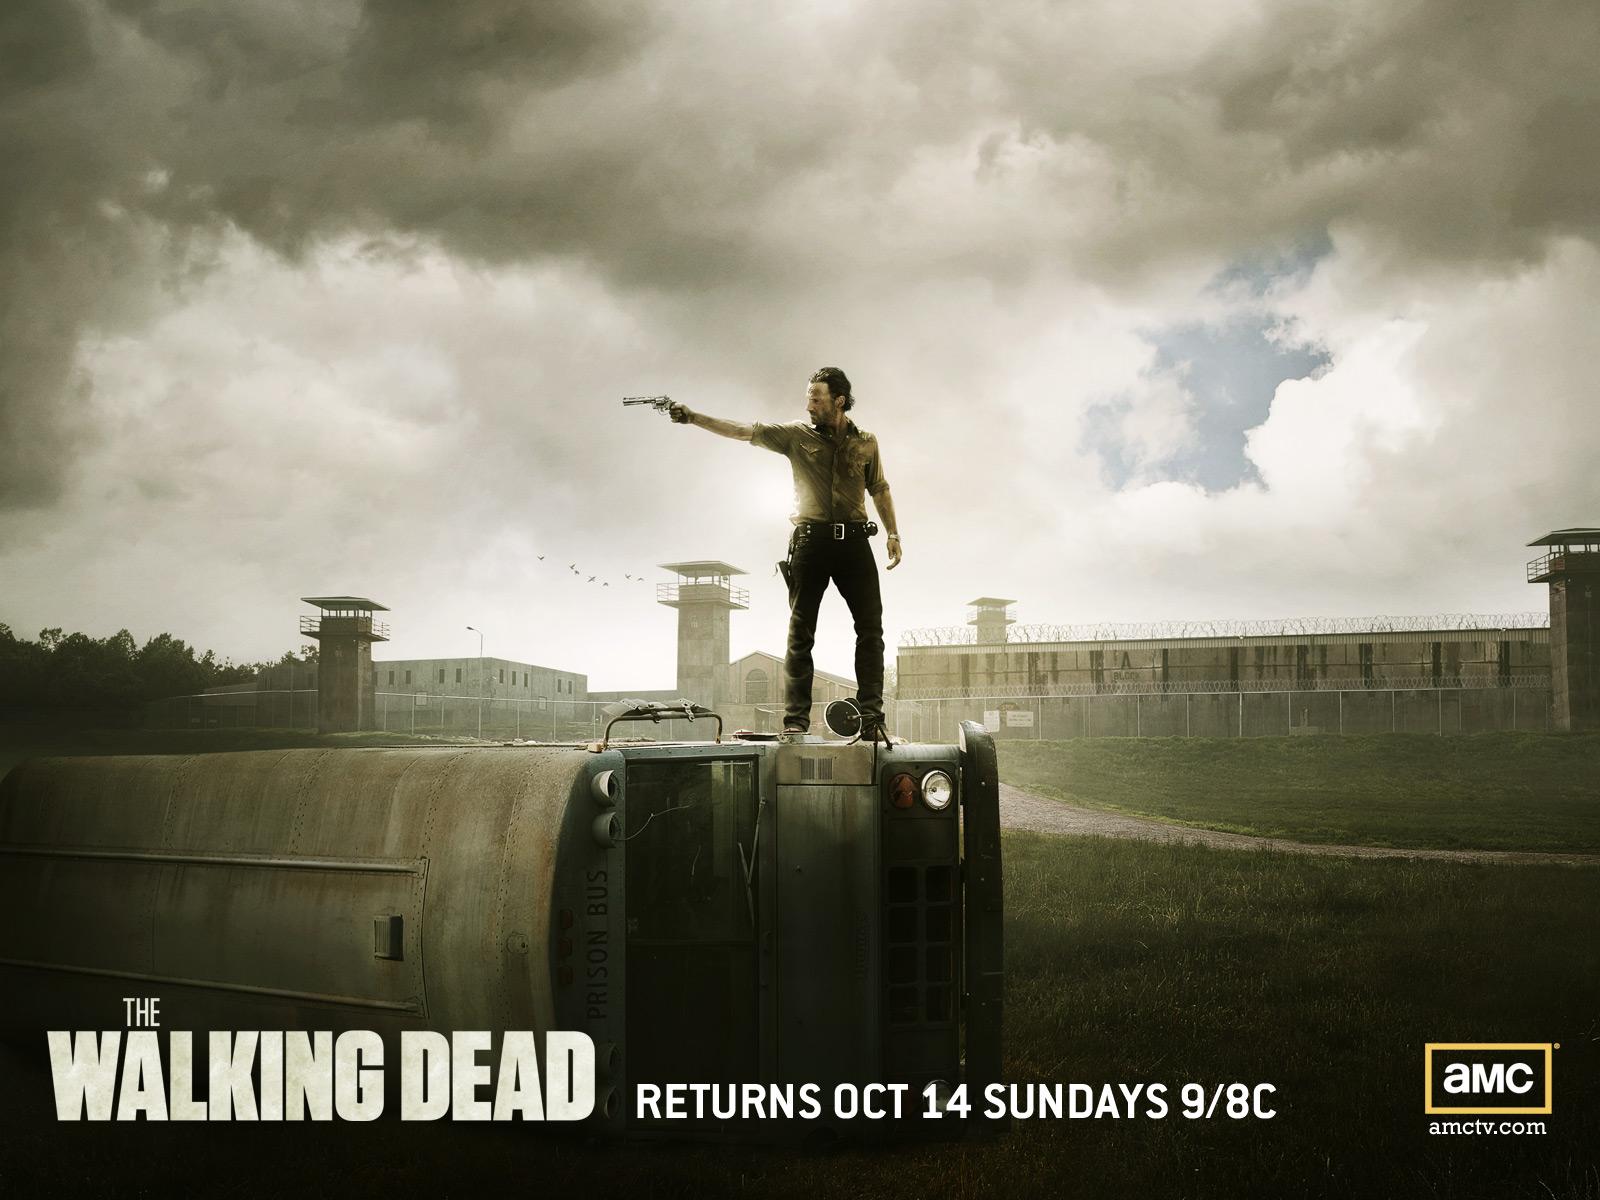 The Walking Dead Season 3 wallpapers Movie Wallpapers 1600x1200